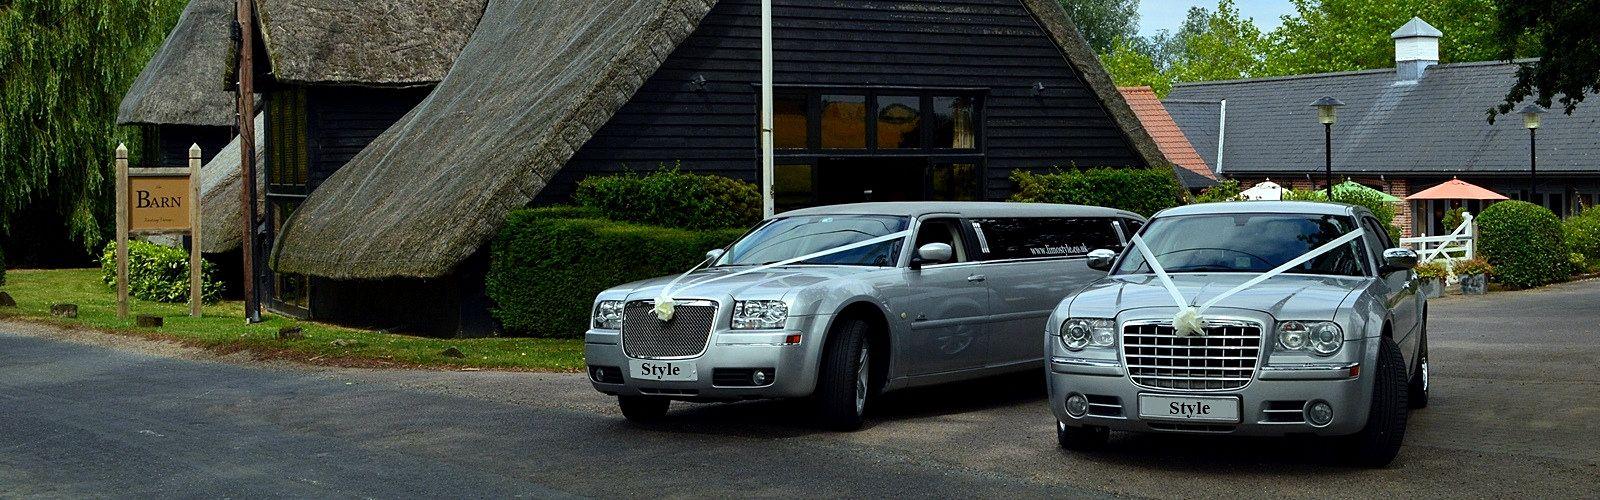 Matching Wedding Cars